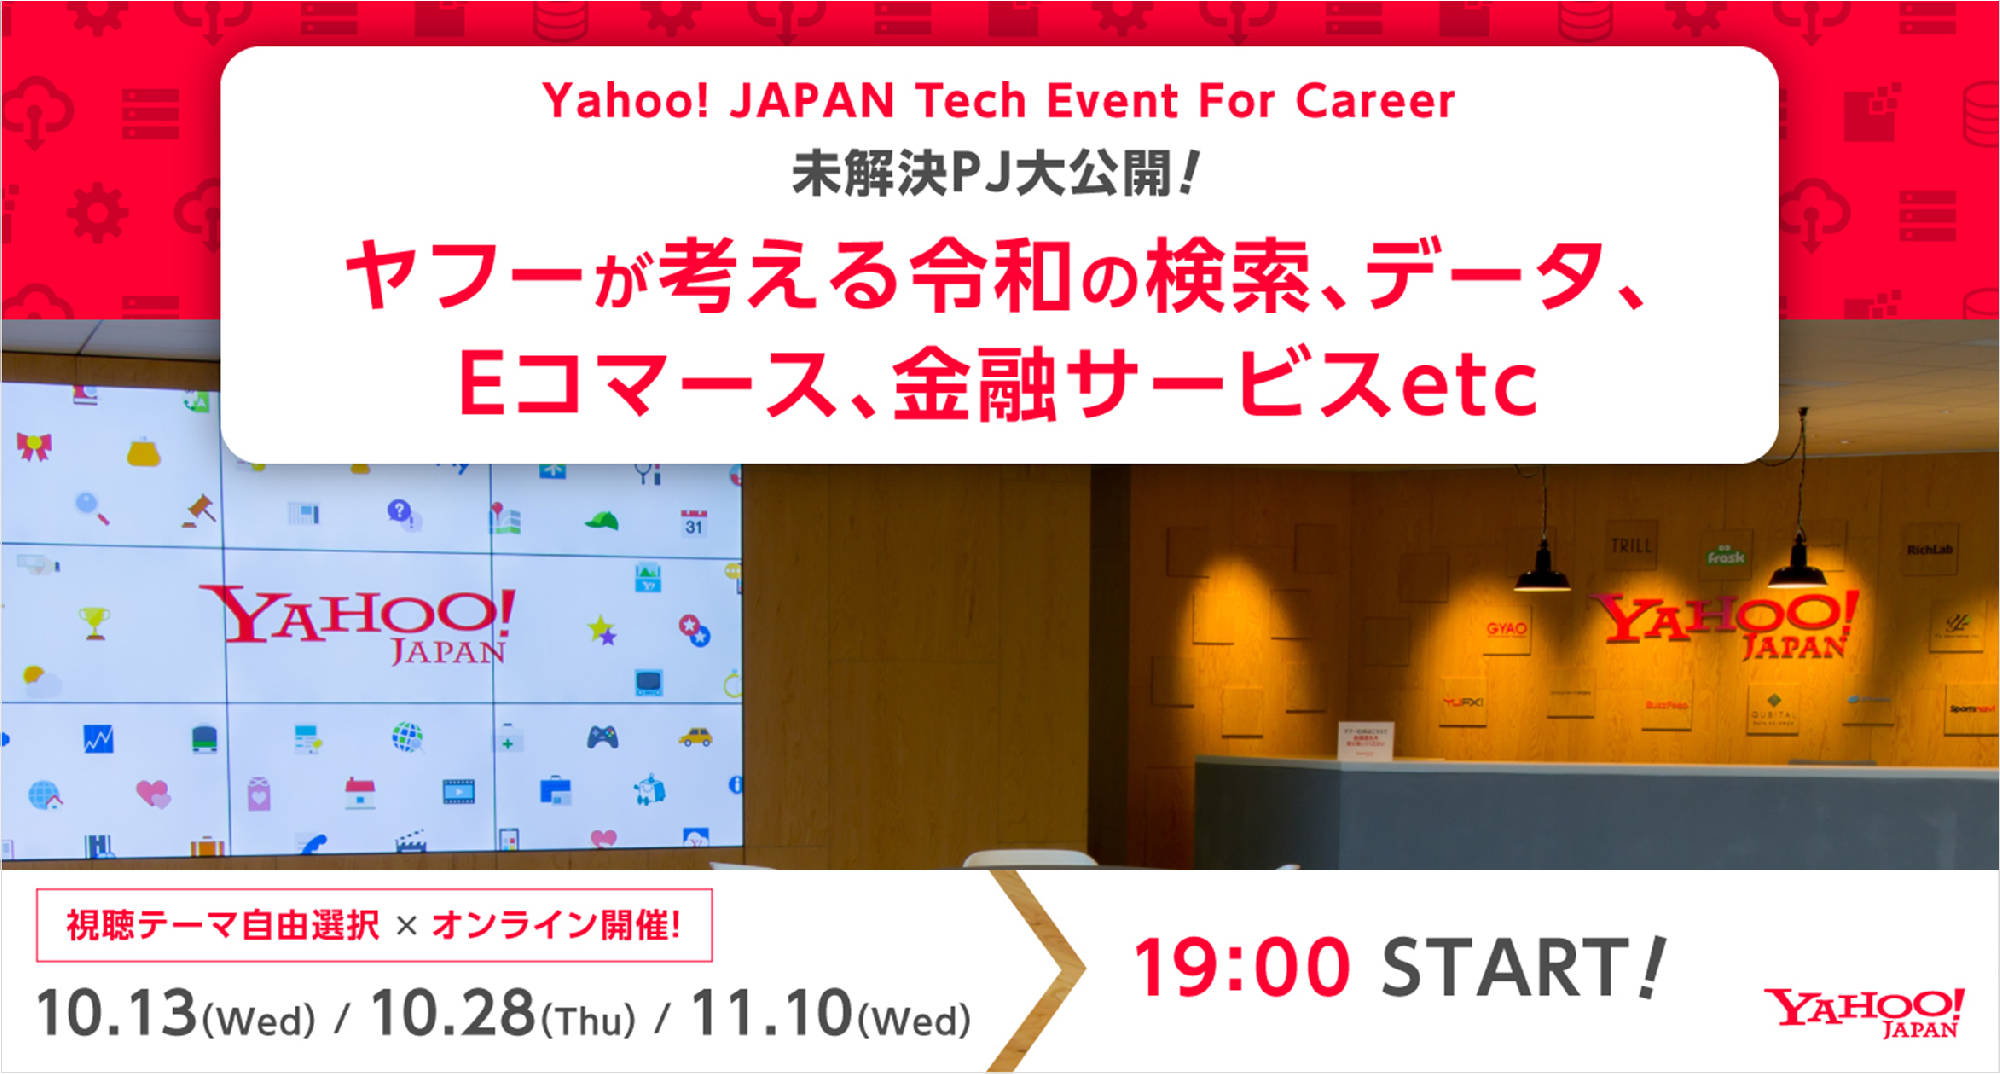 Yahoo! JAPAN Tech Event For Career 2021の開催告知画像